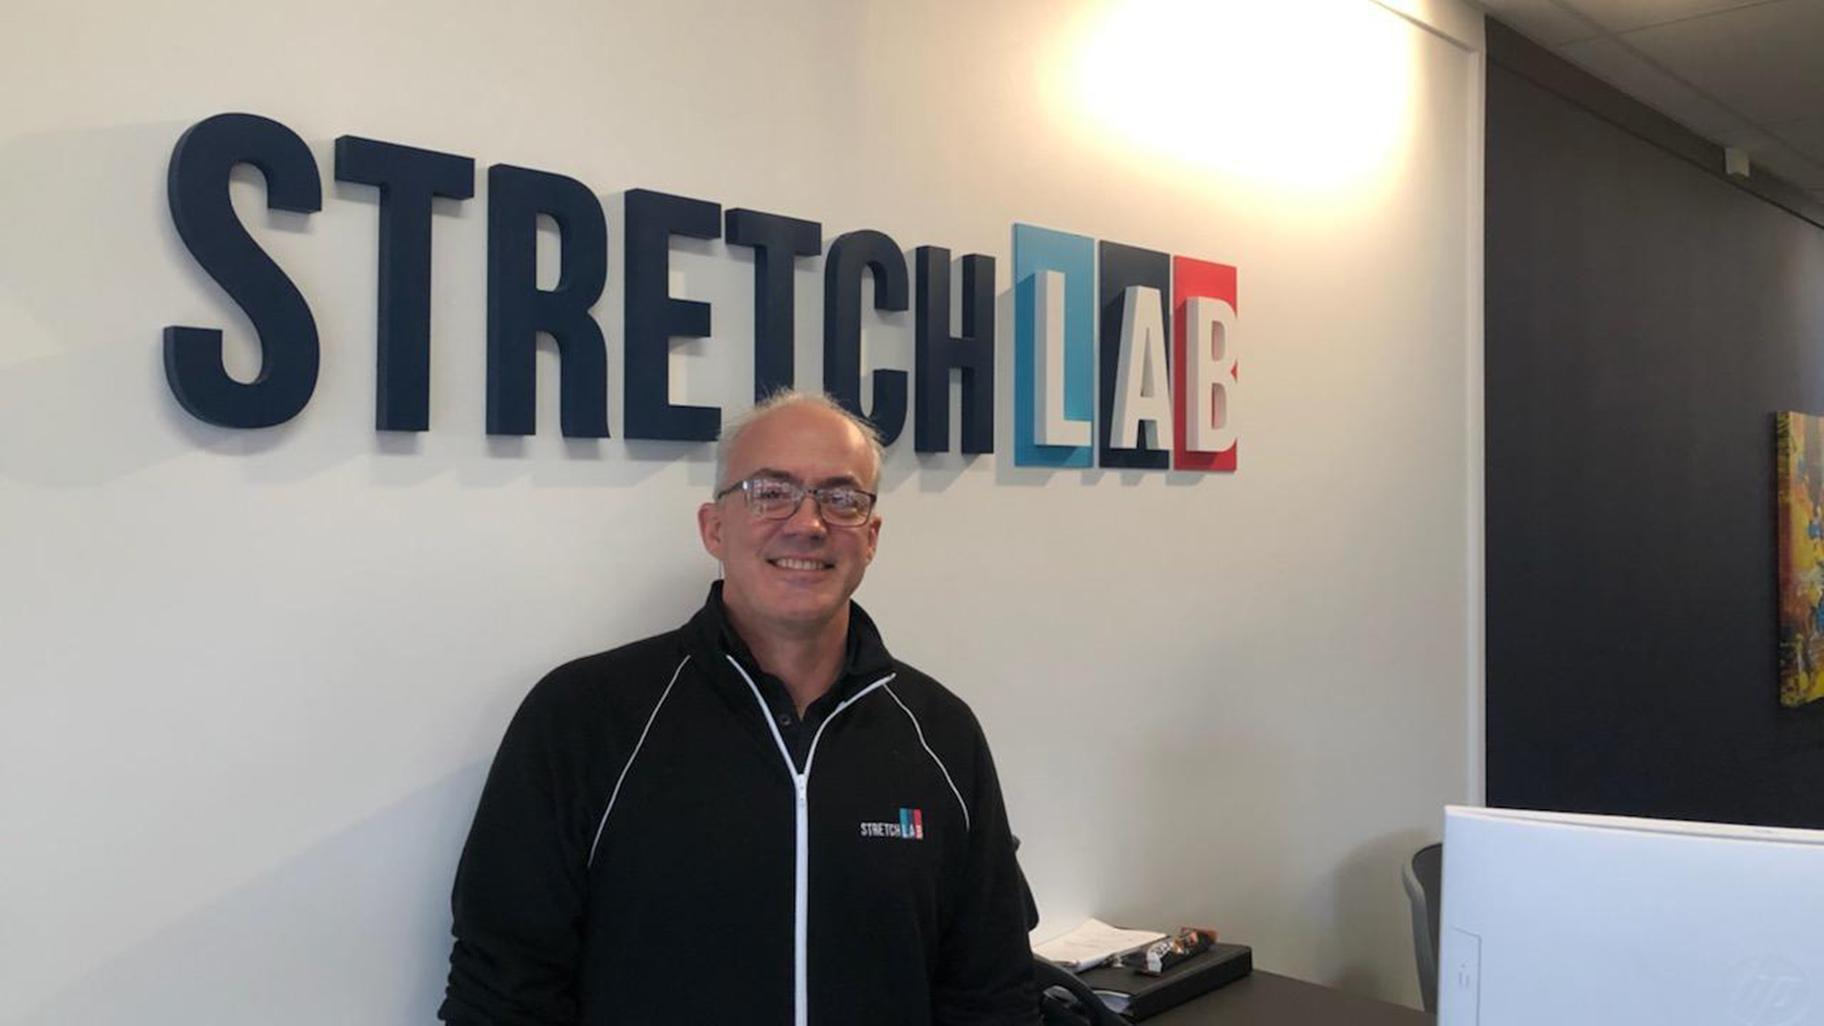 Jay Aldrich, owner of StretchLab in Willowbrook. (Courtesy of Aldrich)